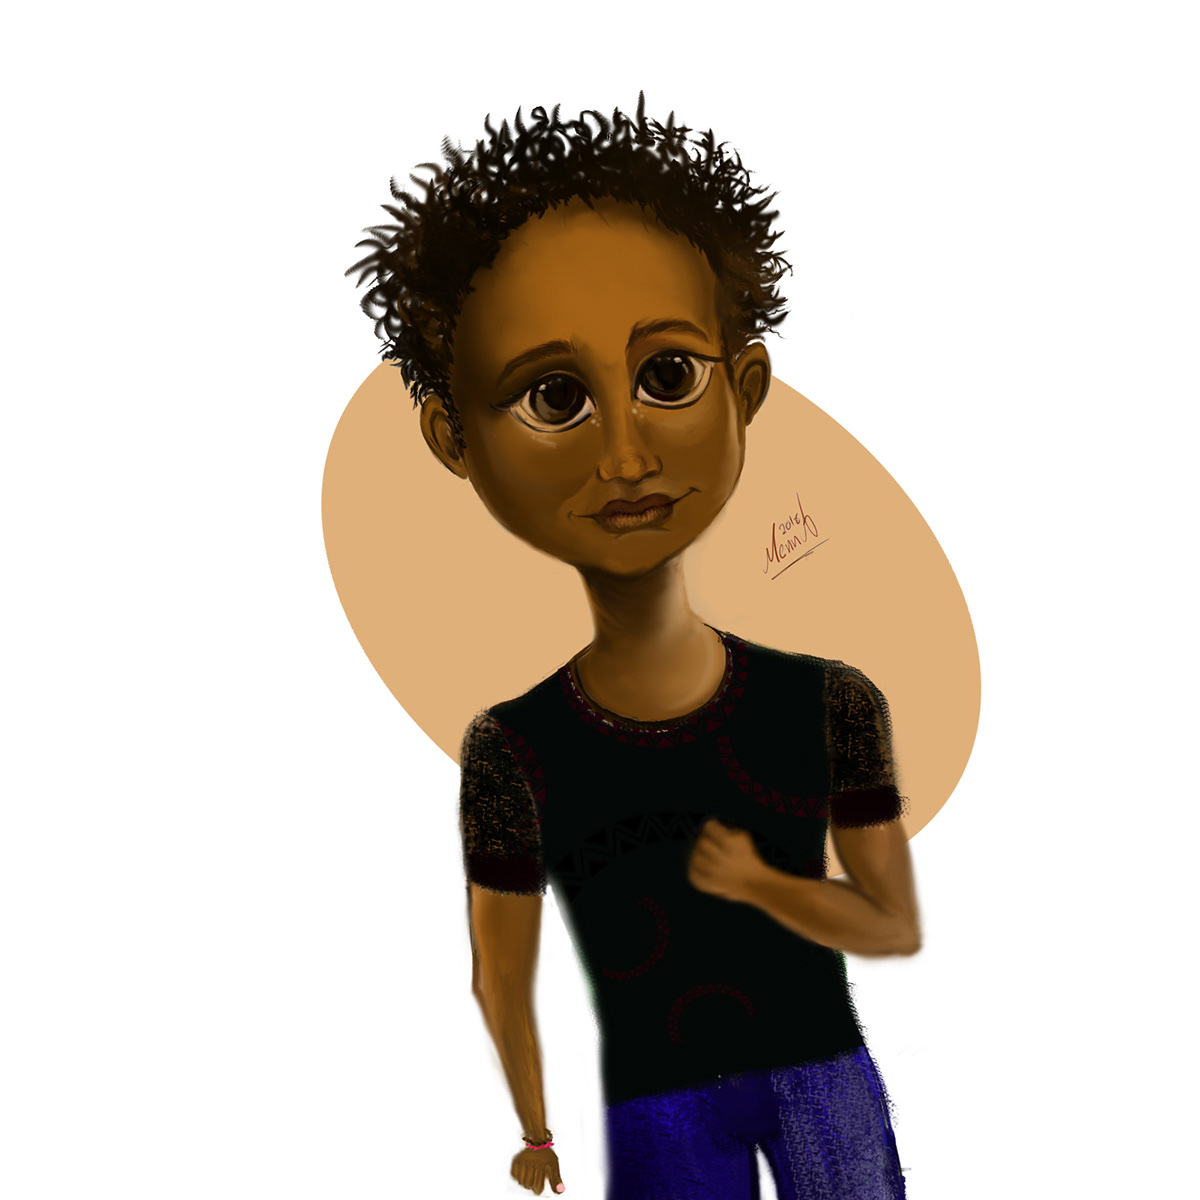 Nubian Character On Wacom Gallery